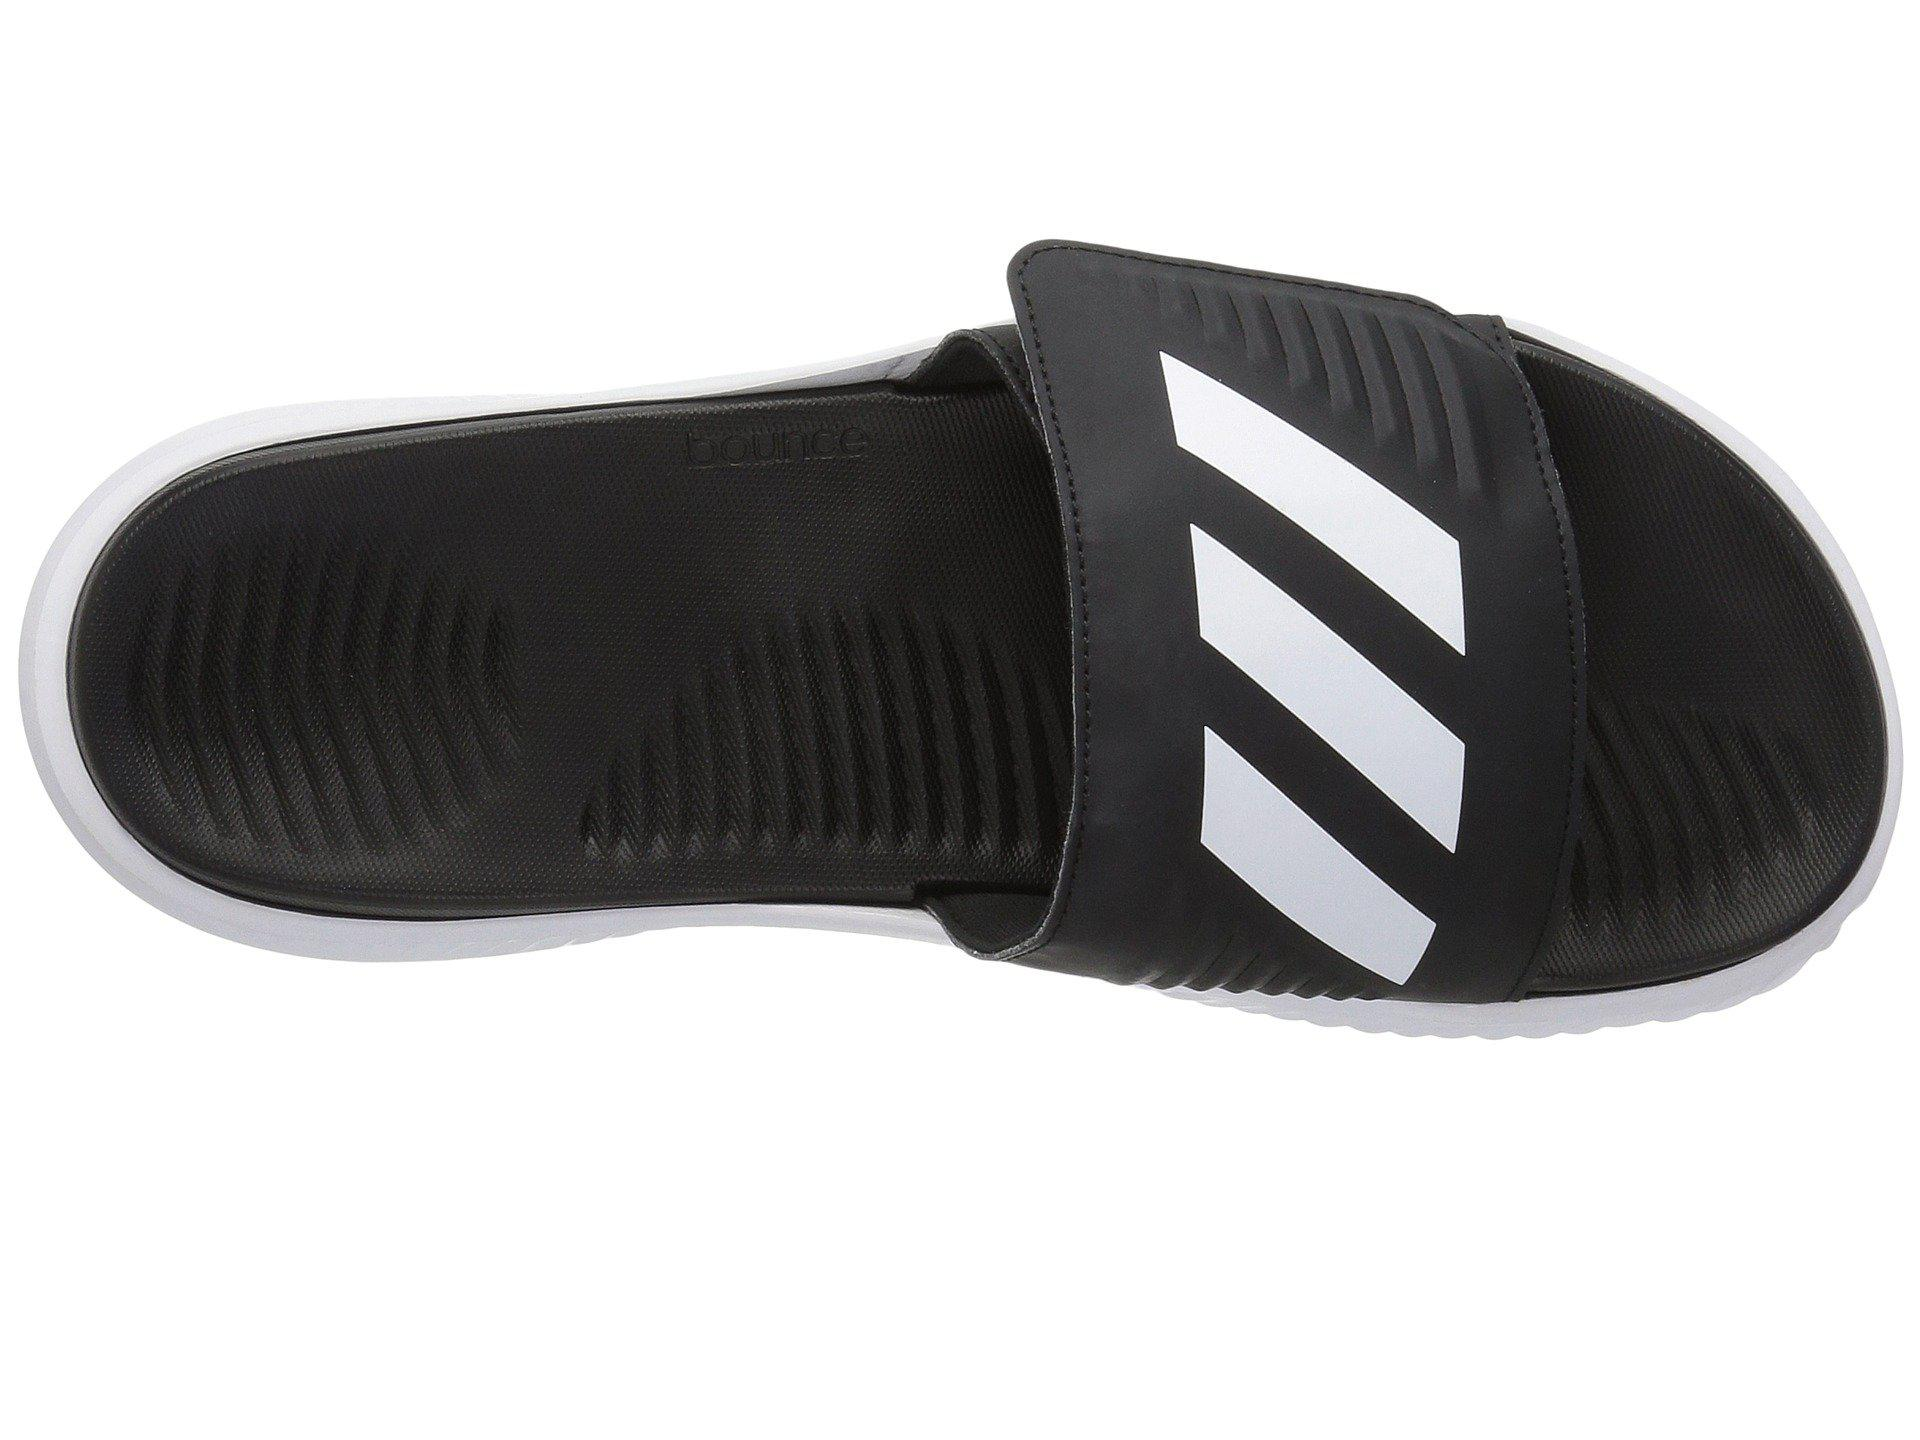 3d053eb0c28 Adidas - Alphabounce Slide (footwear White core Black) Men s Slide Shoes  for Men. View fullscreen